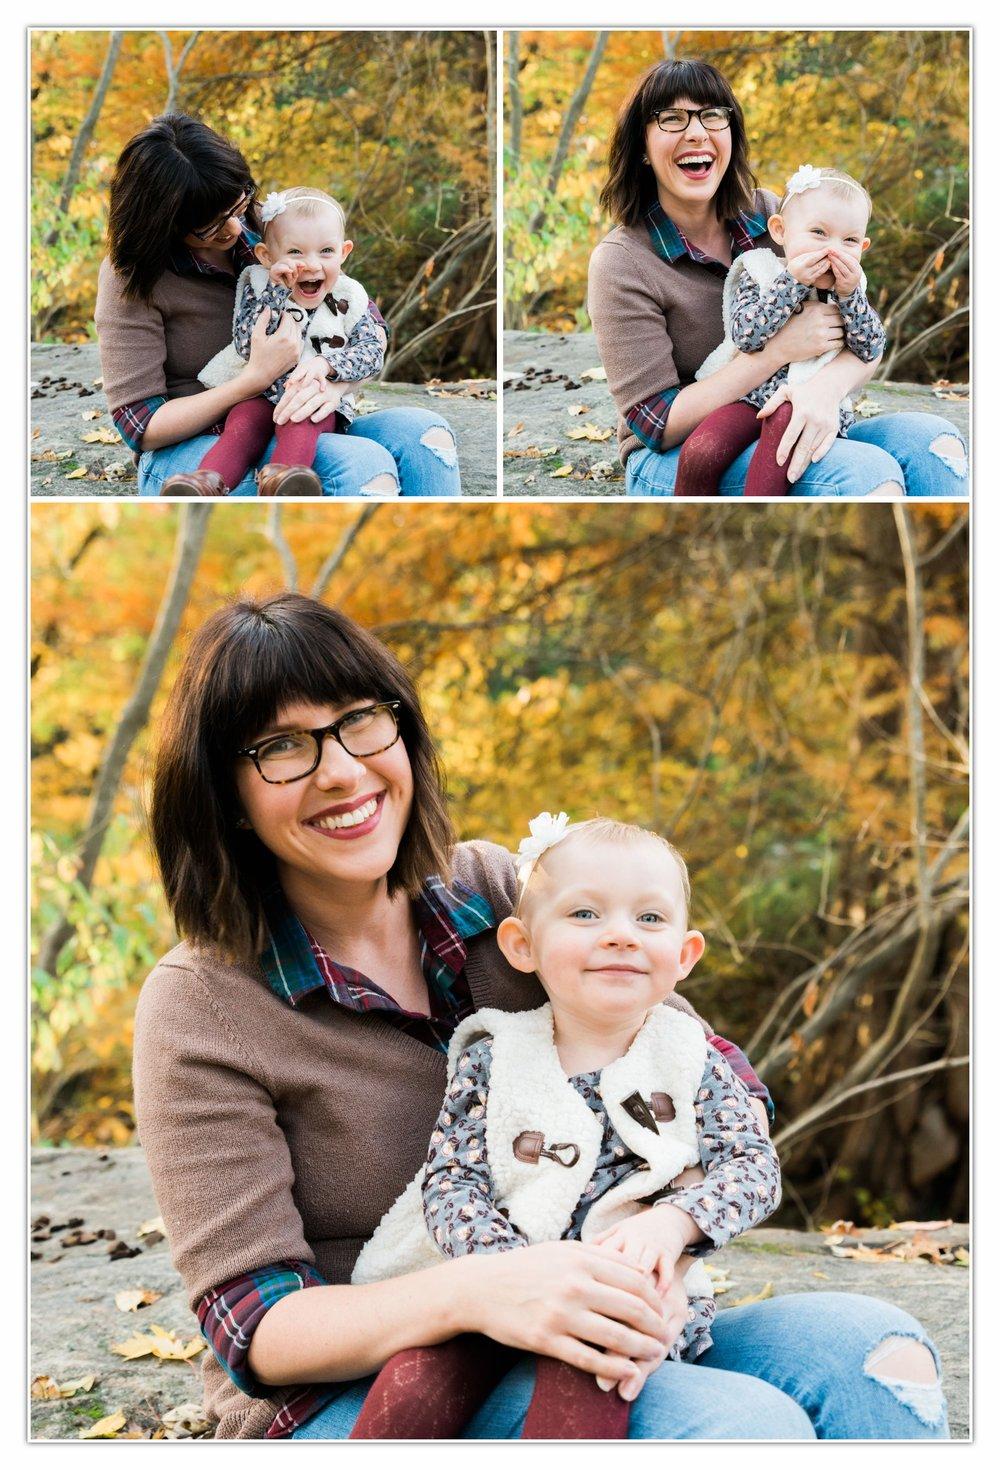 Berryhill Family 2.jpg